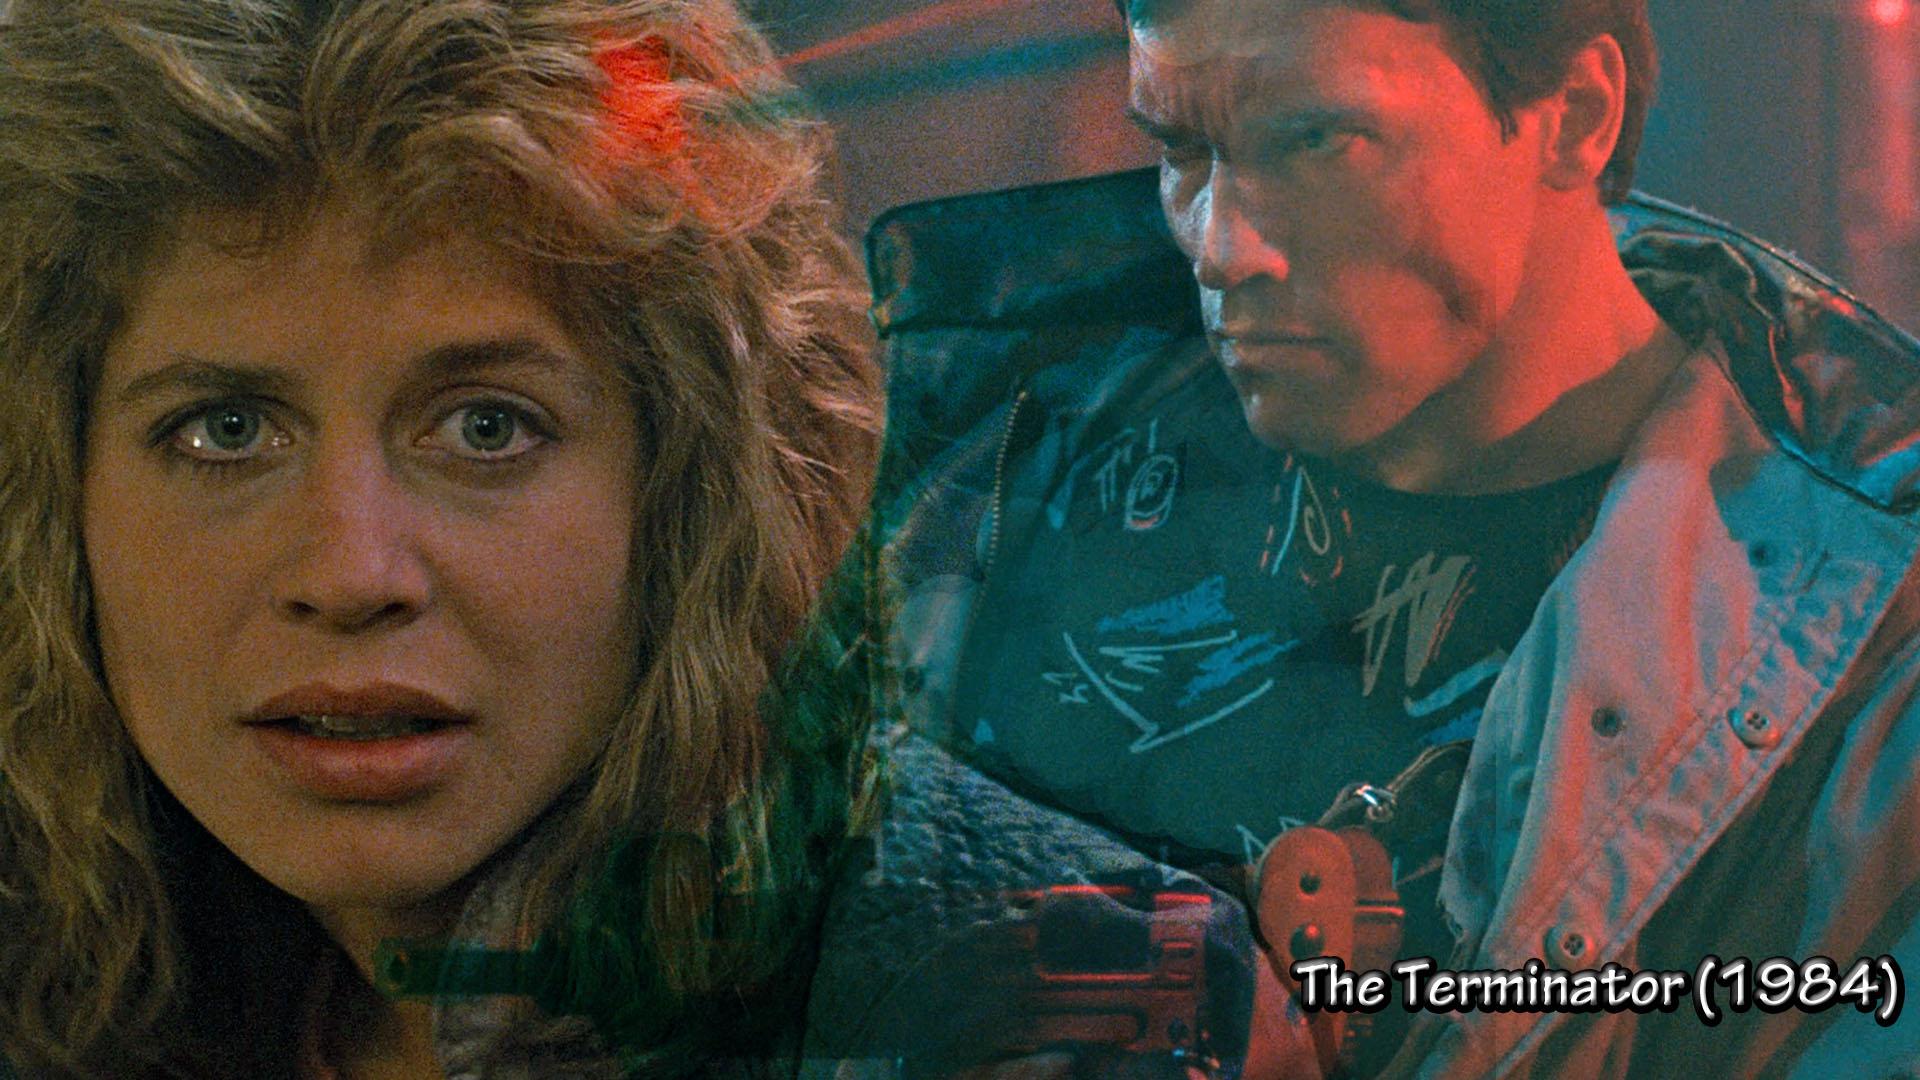 The Terminator 1984 Classic Movies Wallpaper 34828393